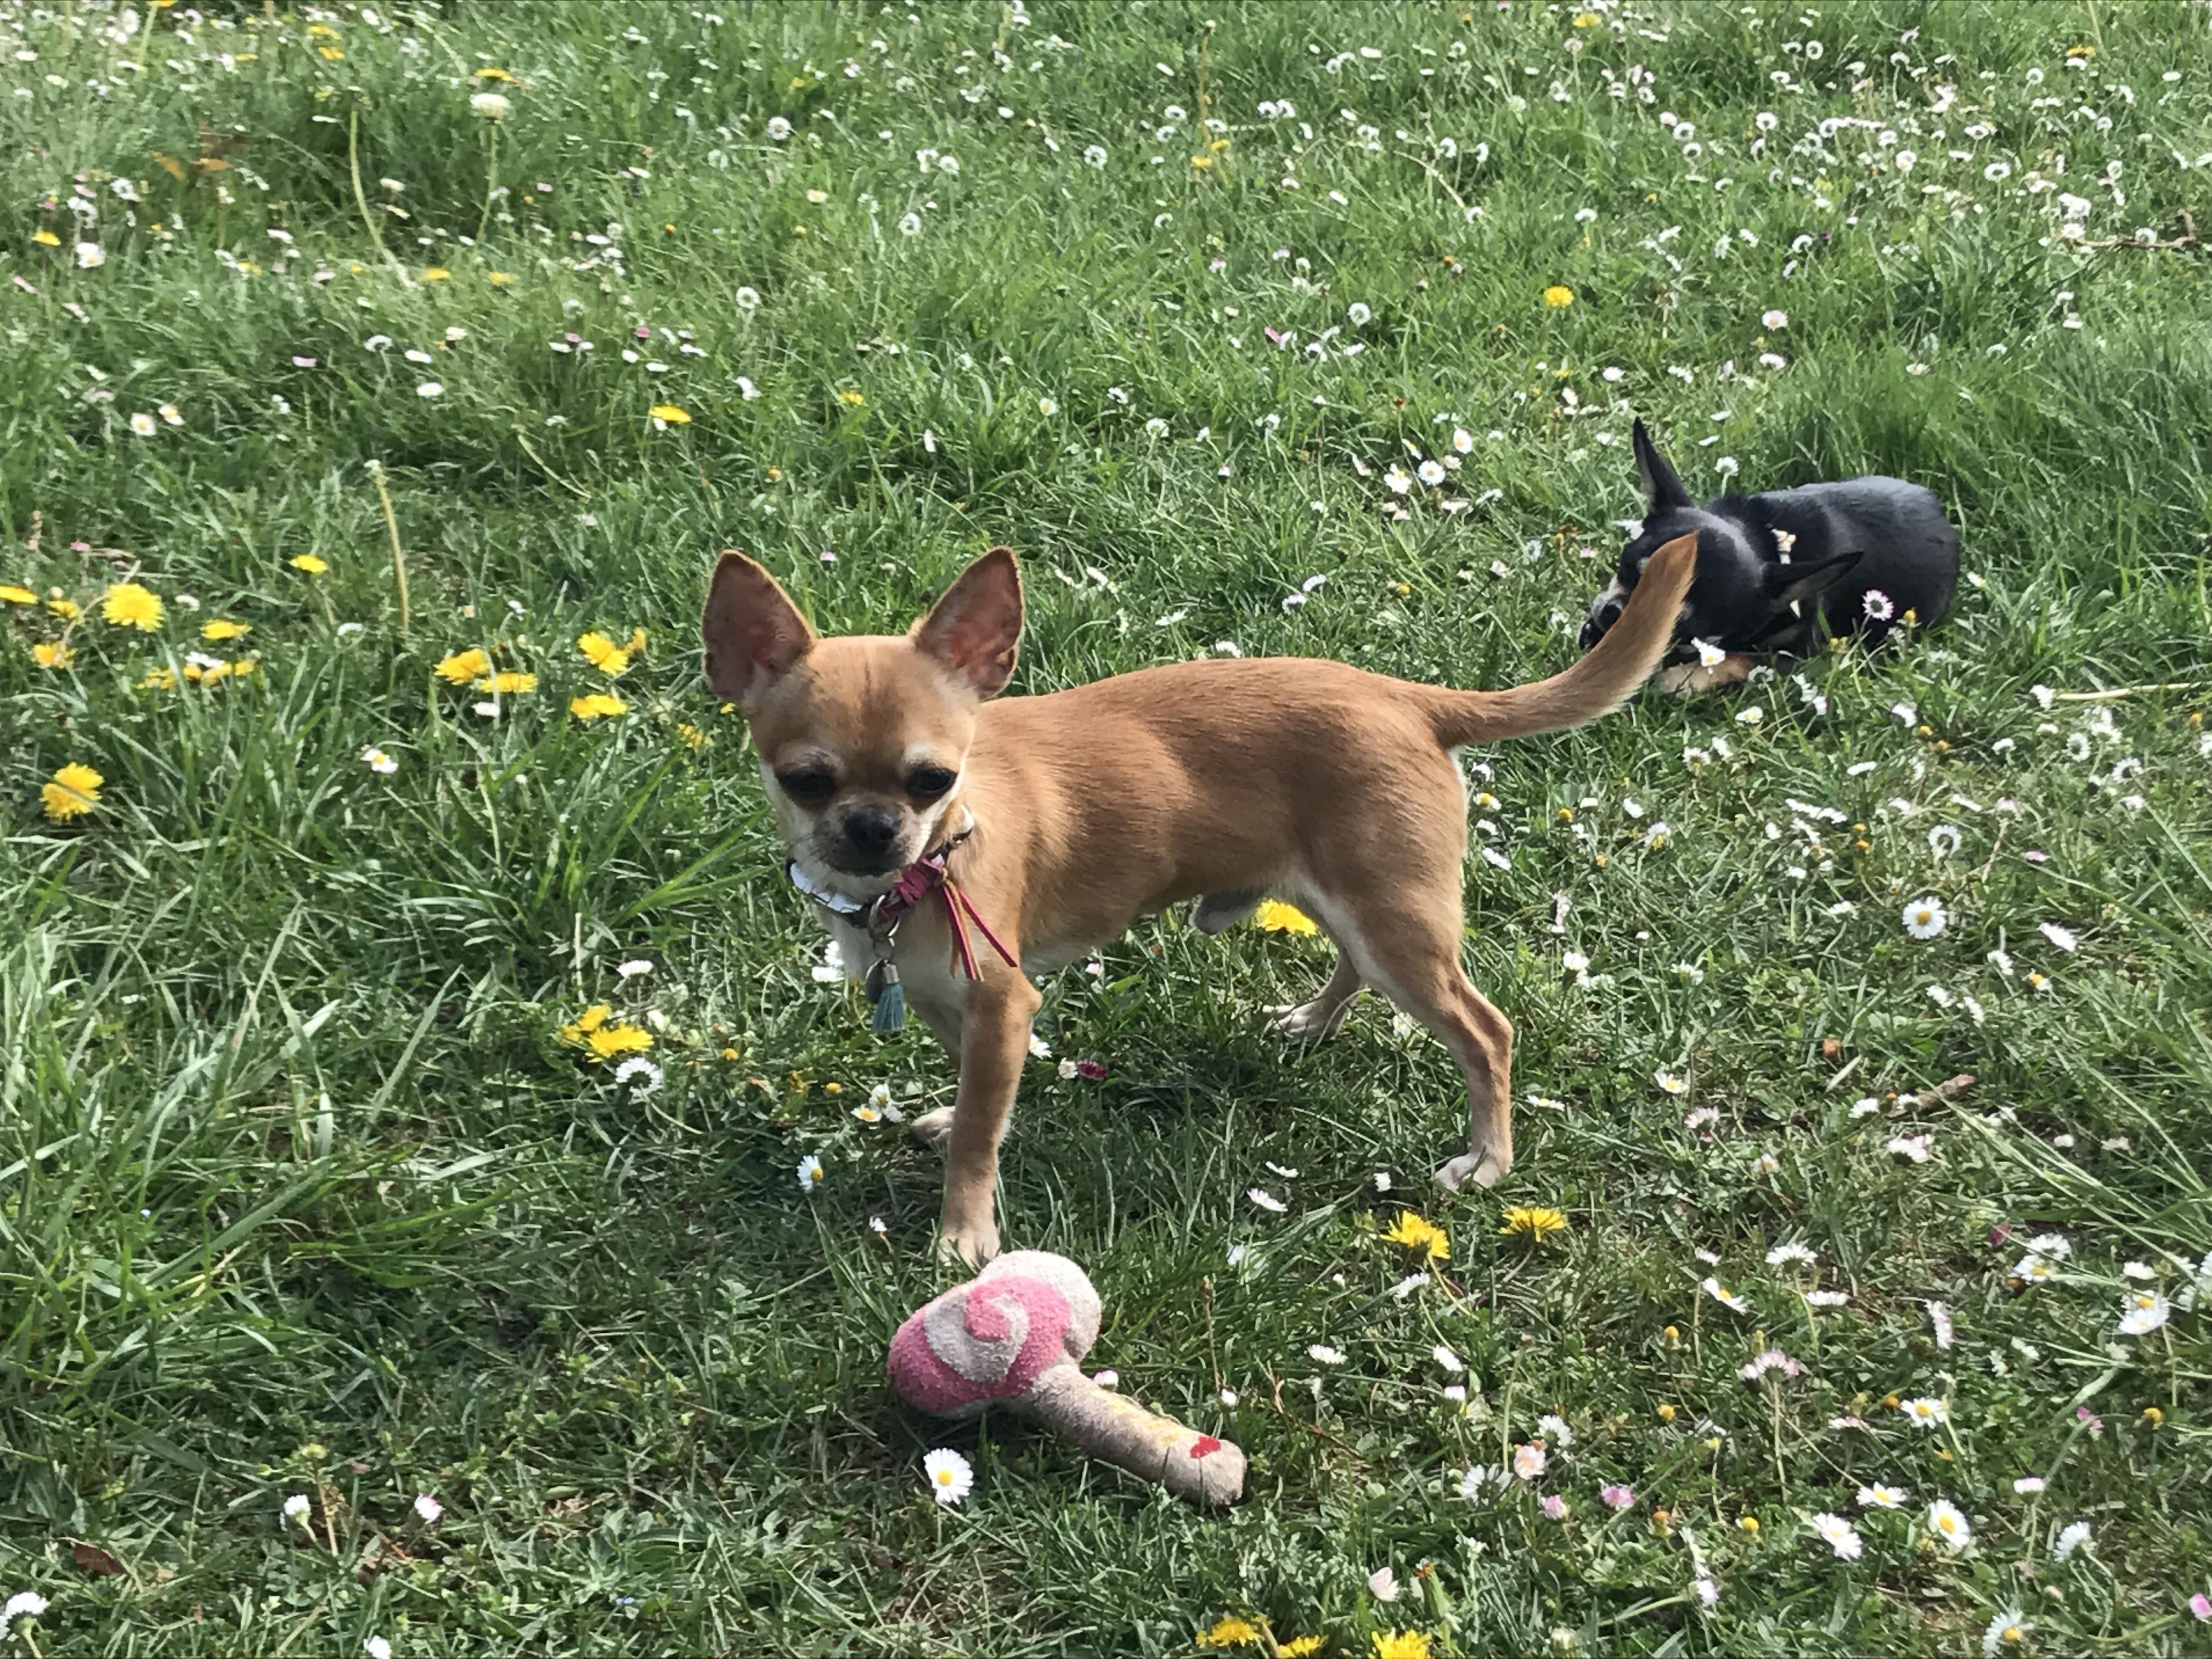 Chihuahua - Nikki dogomania